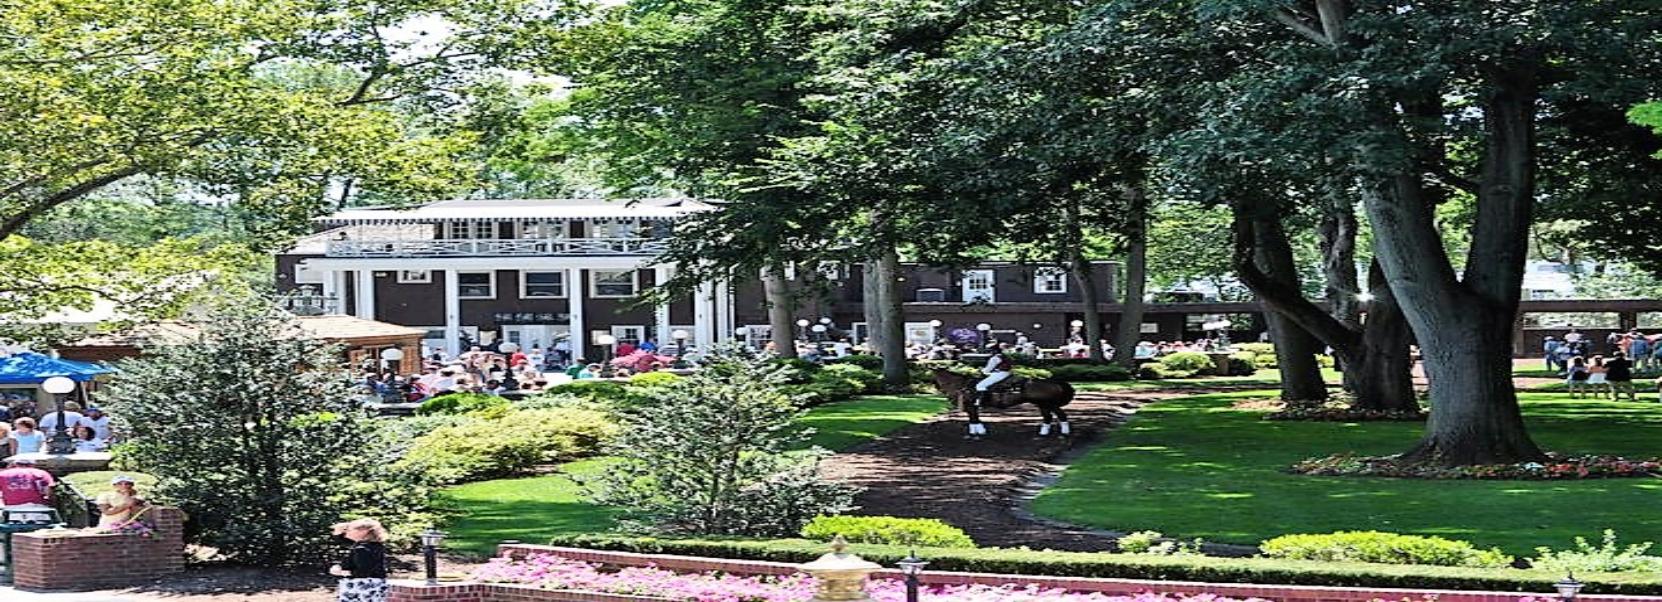 Grove at Delaware Park